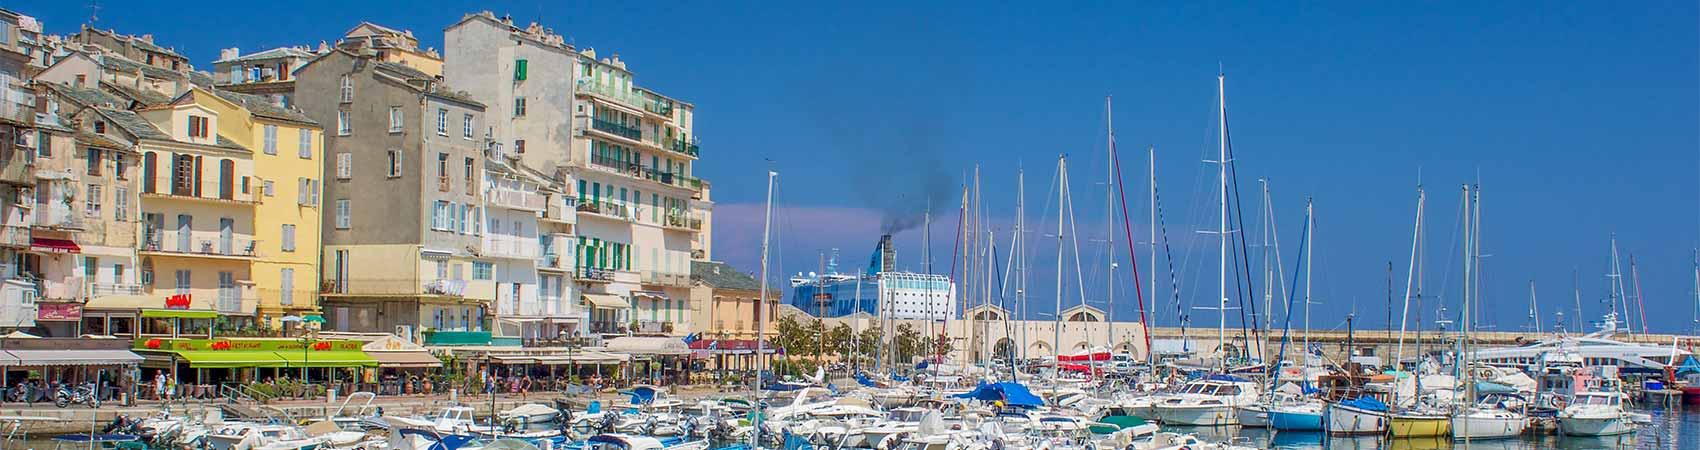 vacances camping Bastia